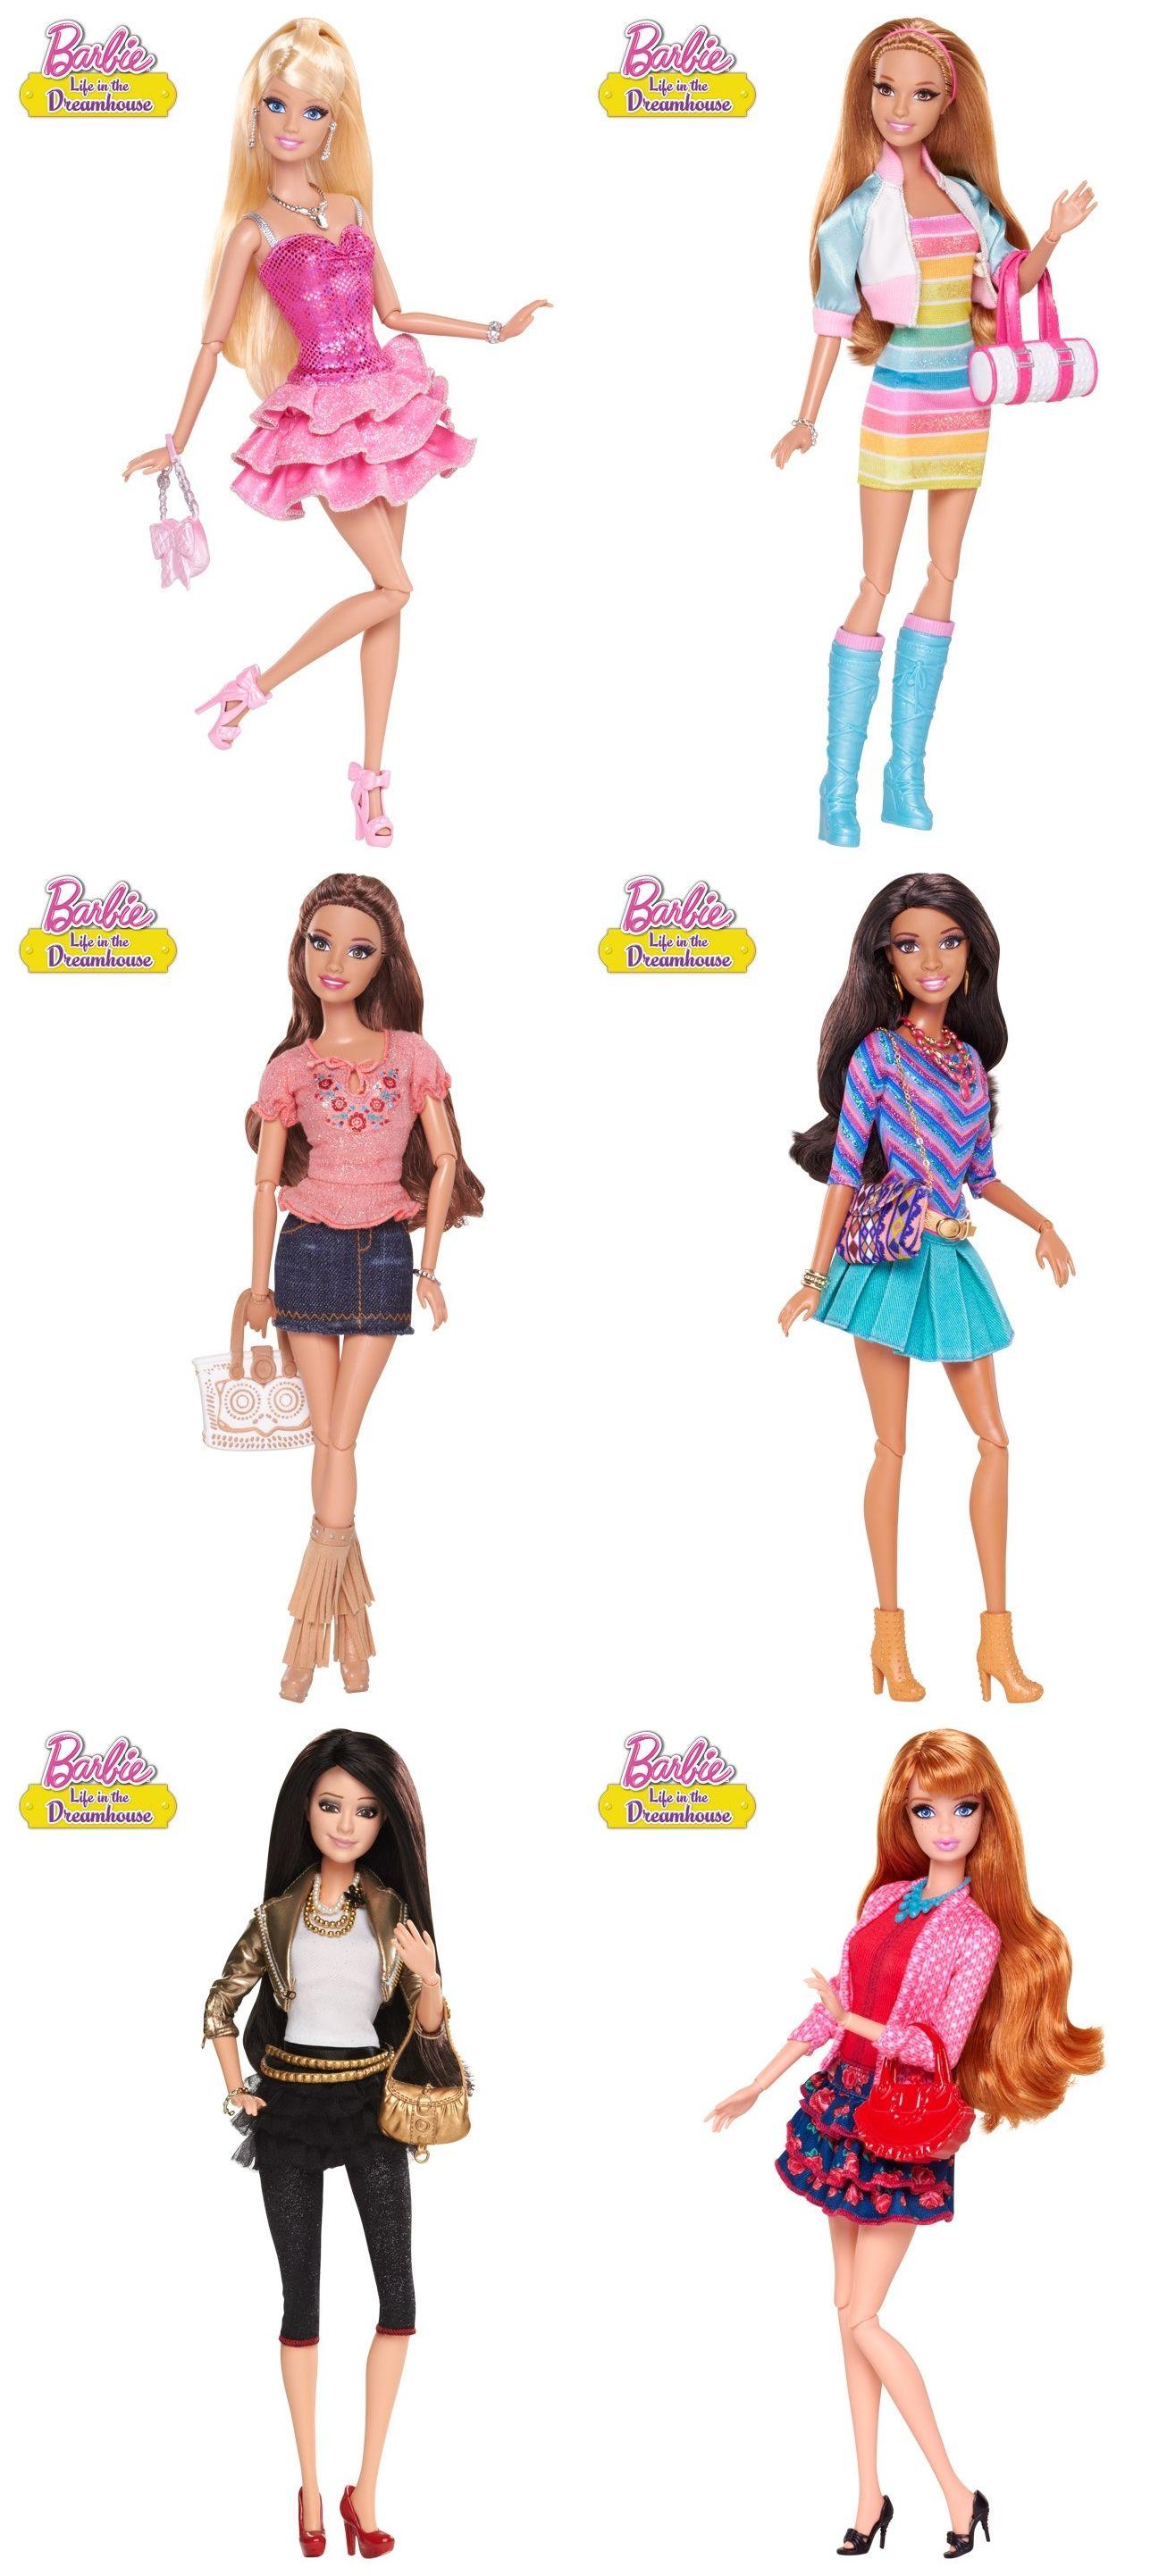 7e6849947f37c Barbie life in the dreamhouse doll collection Roupas Para Barbie, Bonecas  Barbie, Roupas Para